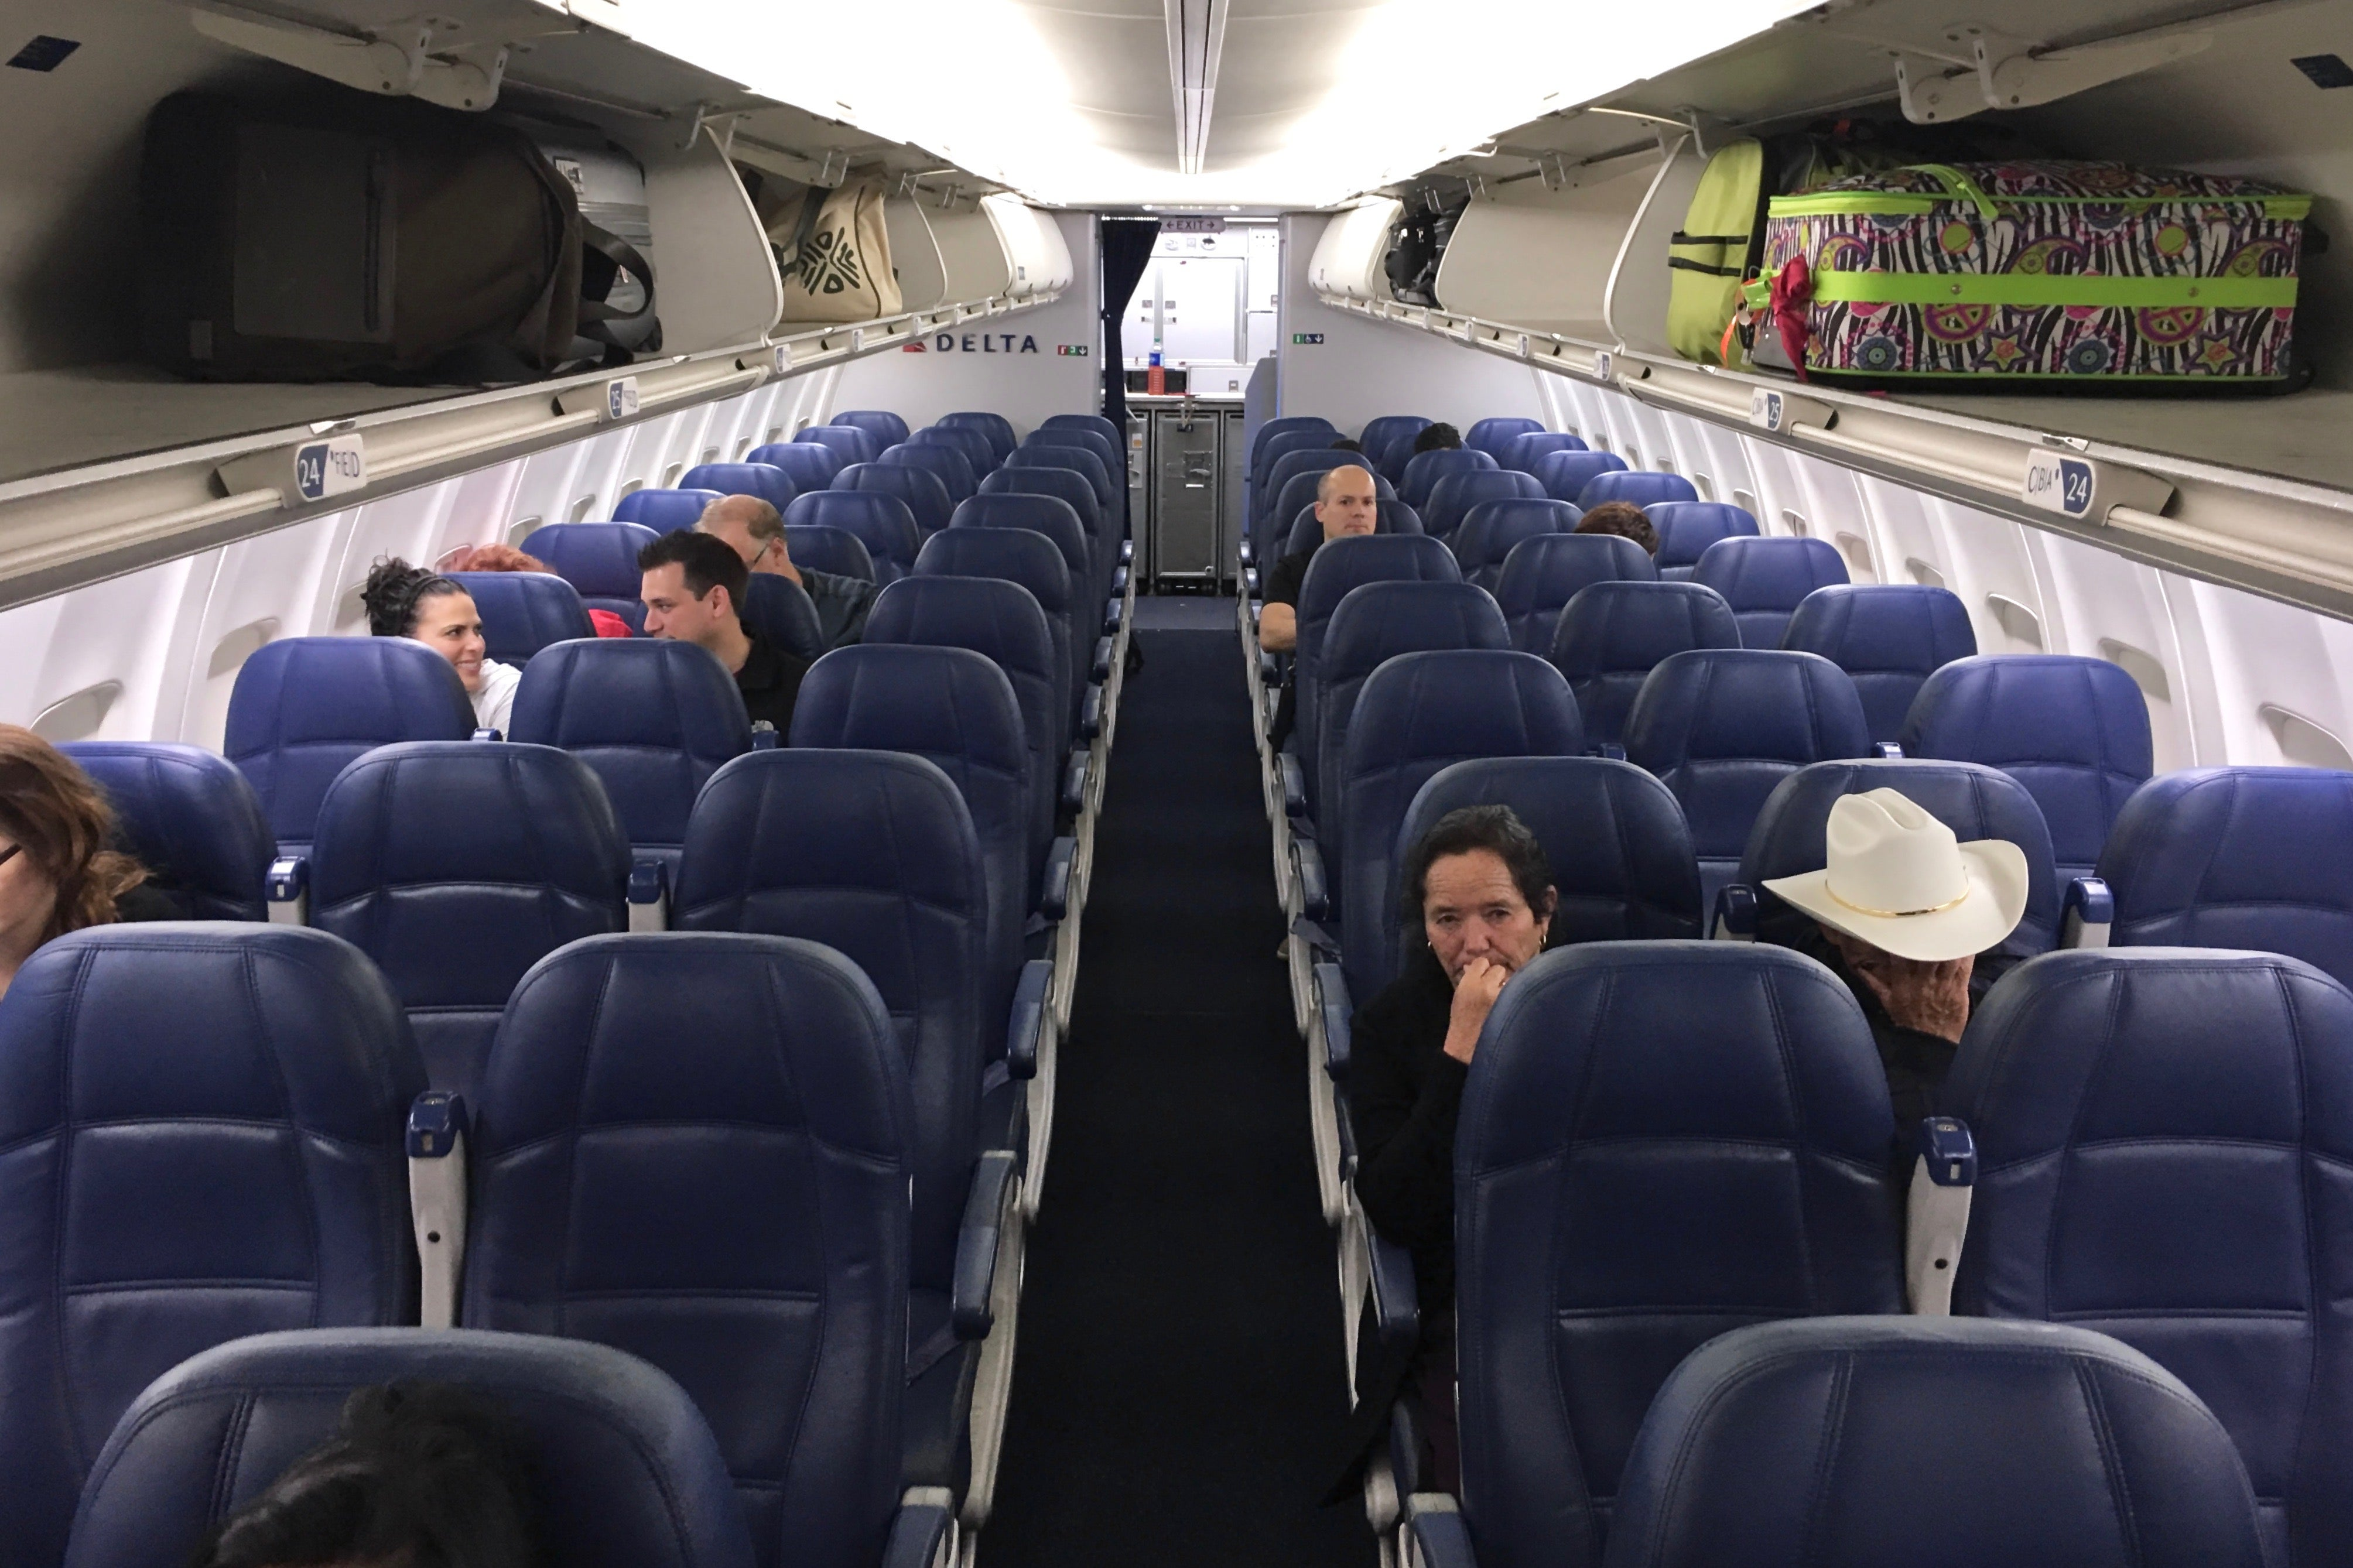 Delta Boeing 737 800 Seating Wallseat Co